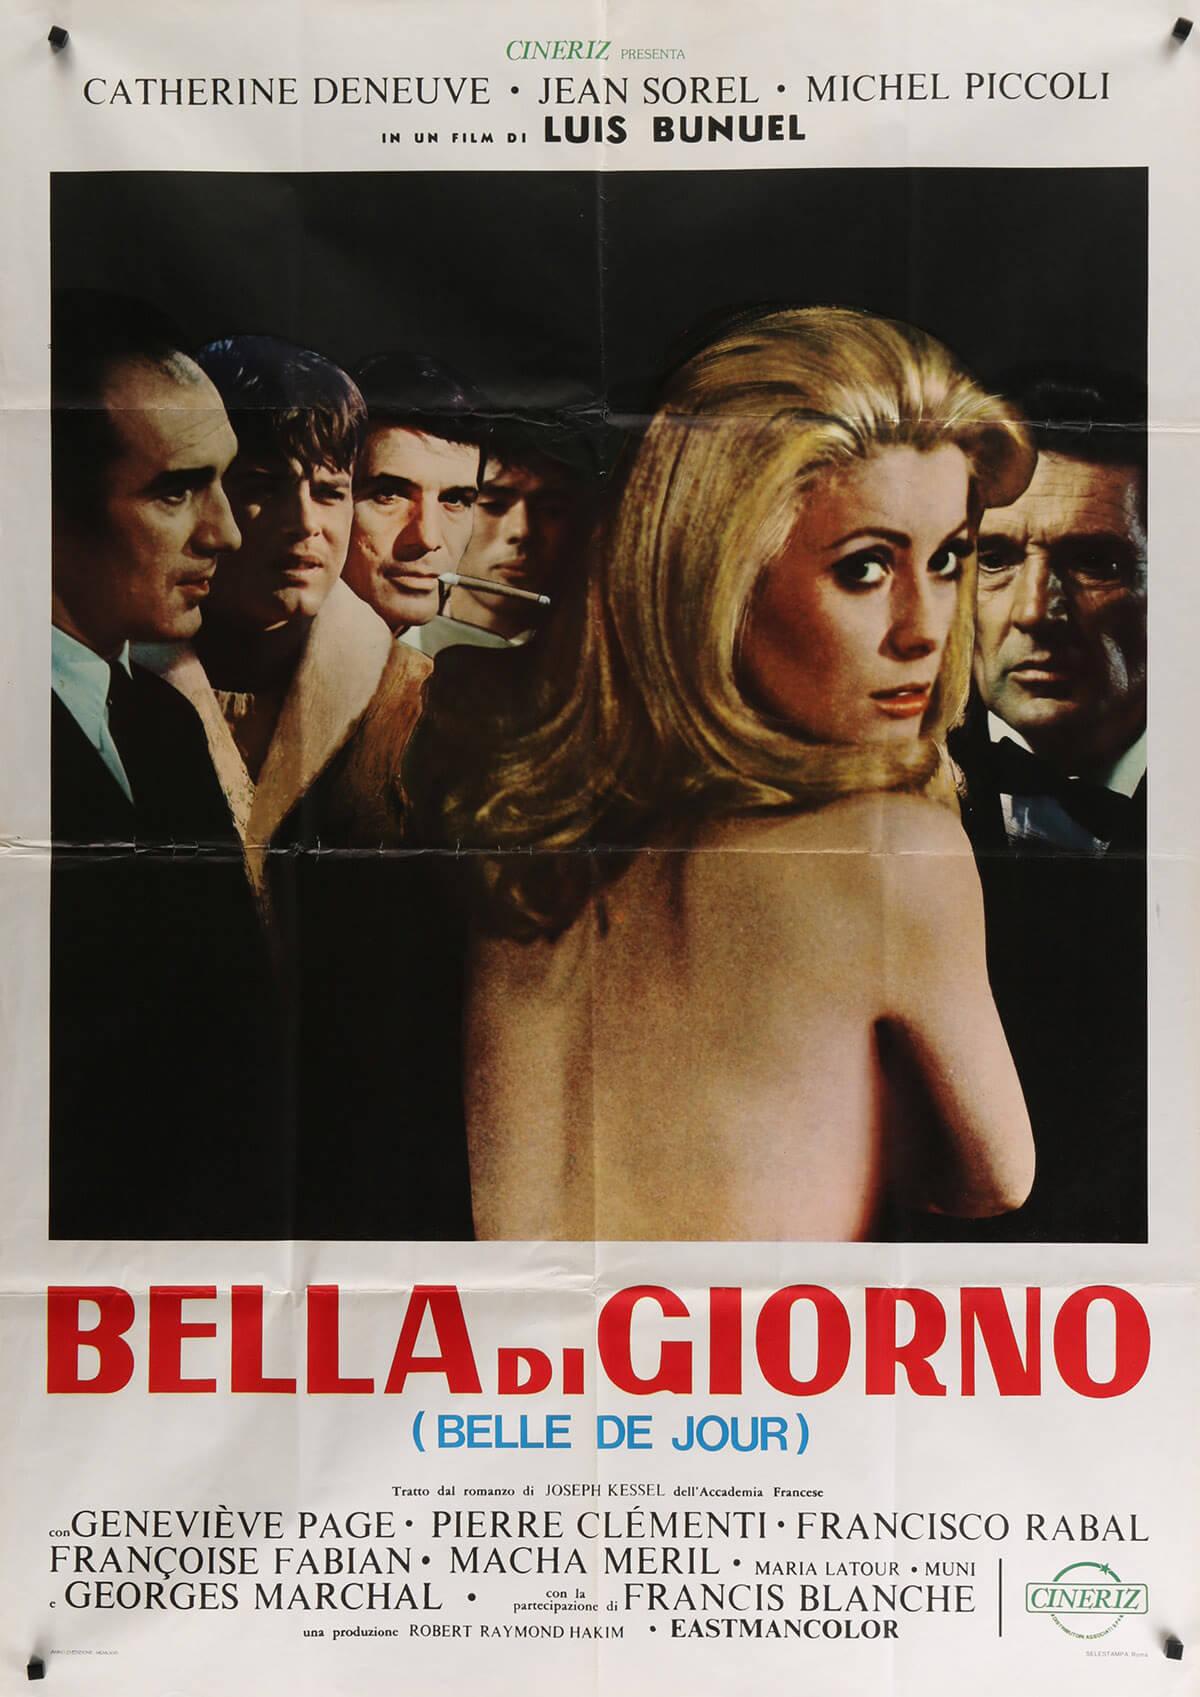 مشاهدة فيلم Belle de jour 1967 مترجم